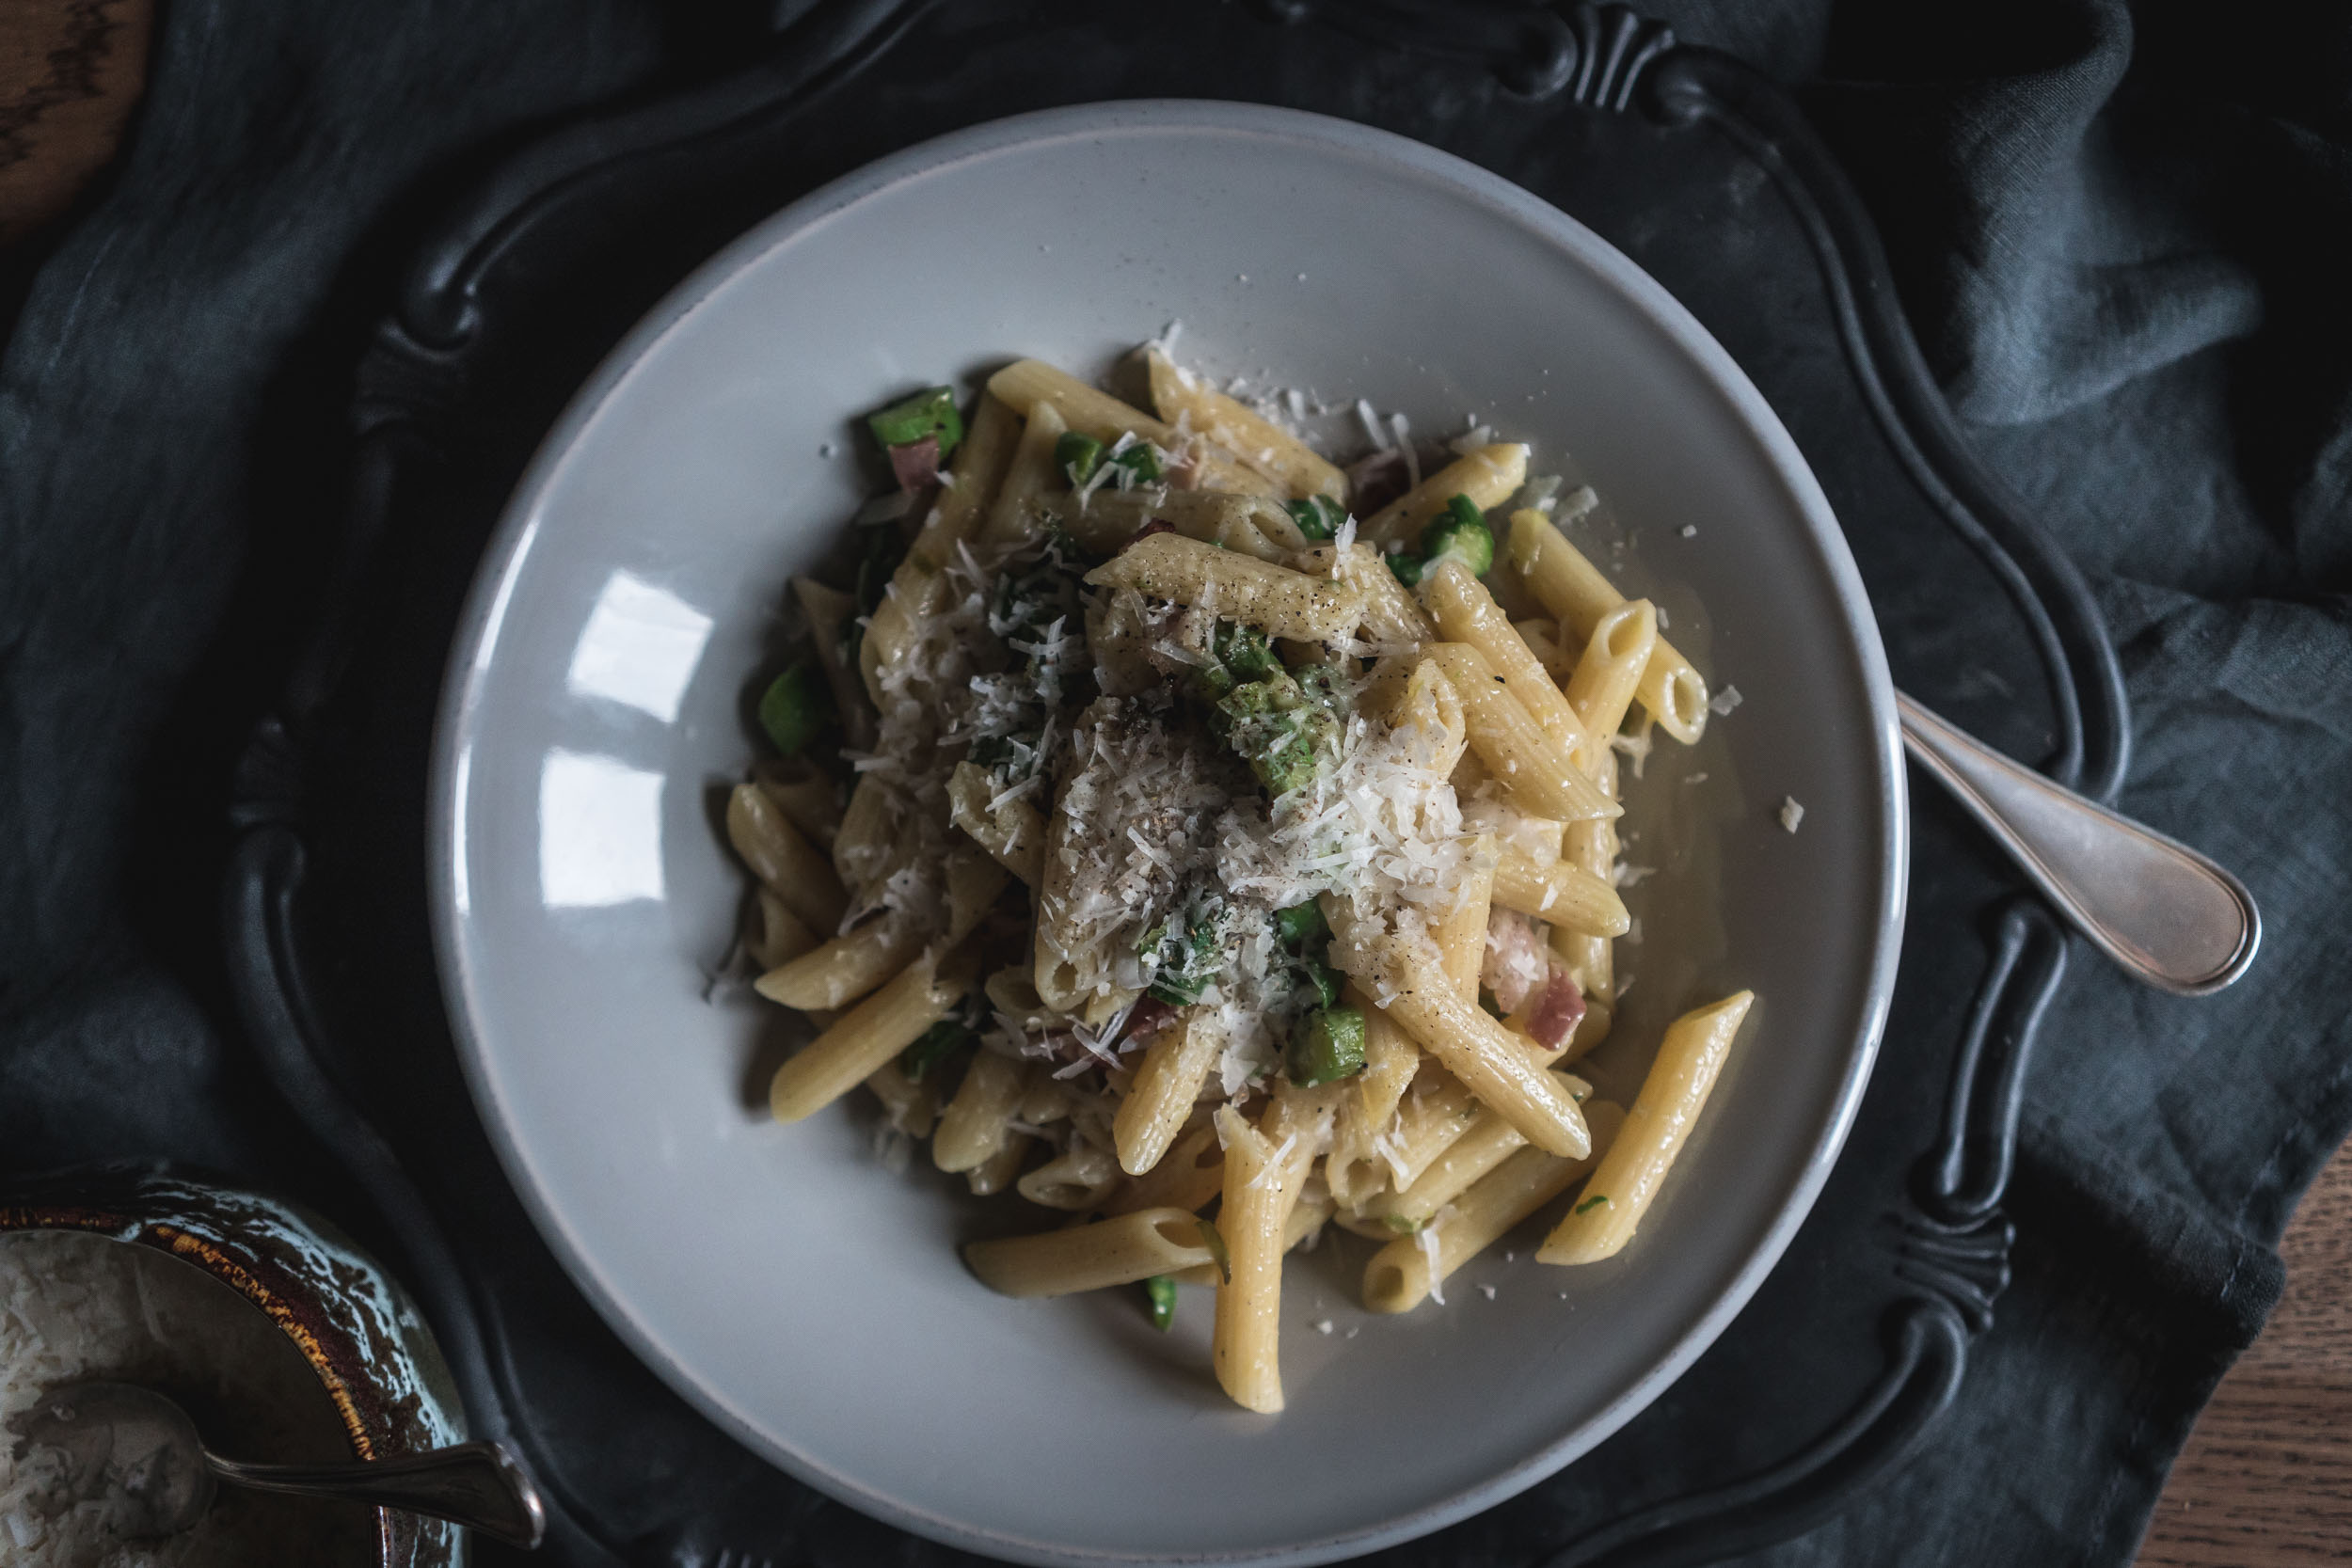 Asparagus-and-Bacon-Penne-Pasta-05131.jpg